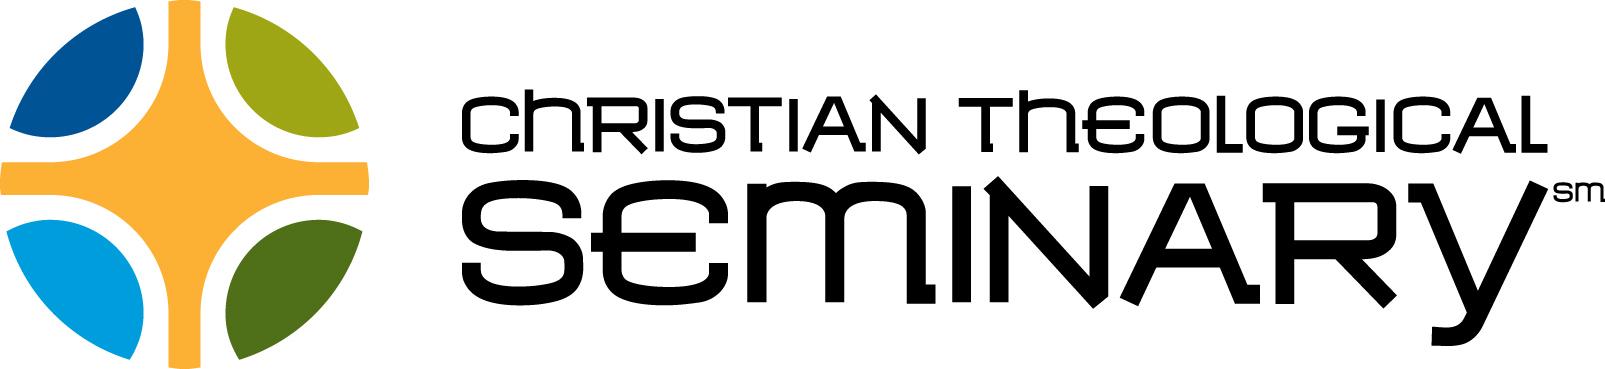 CTS_4C_Logotype